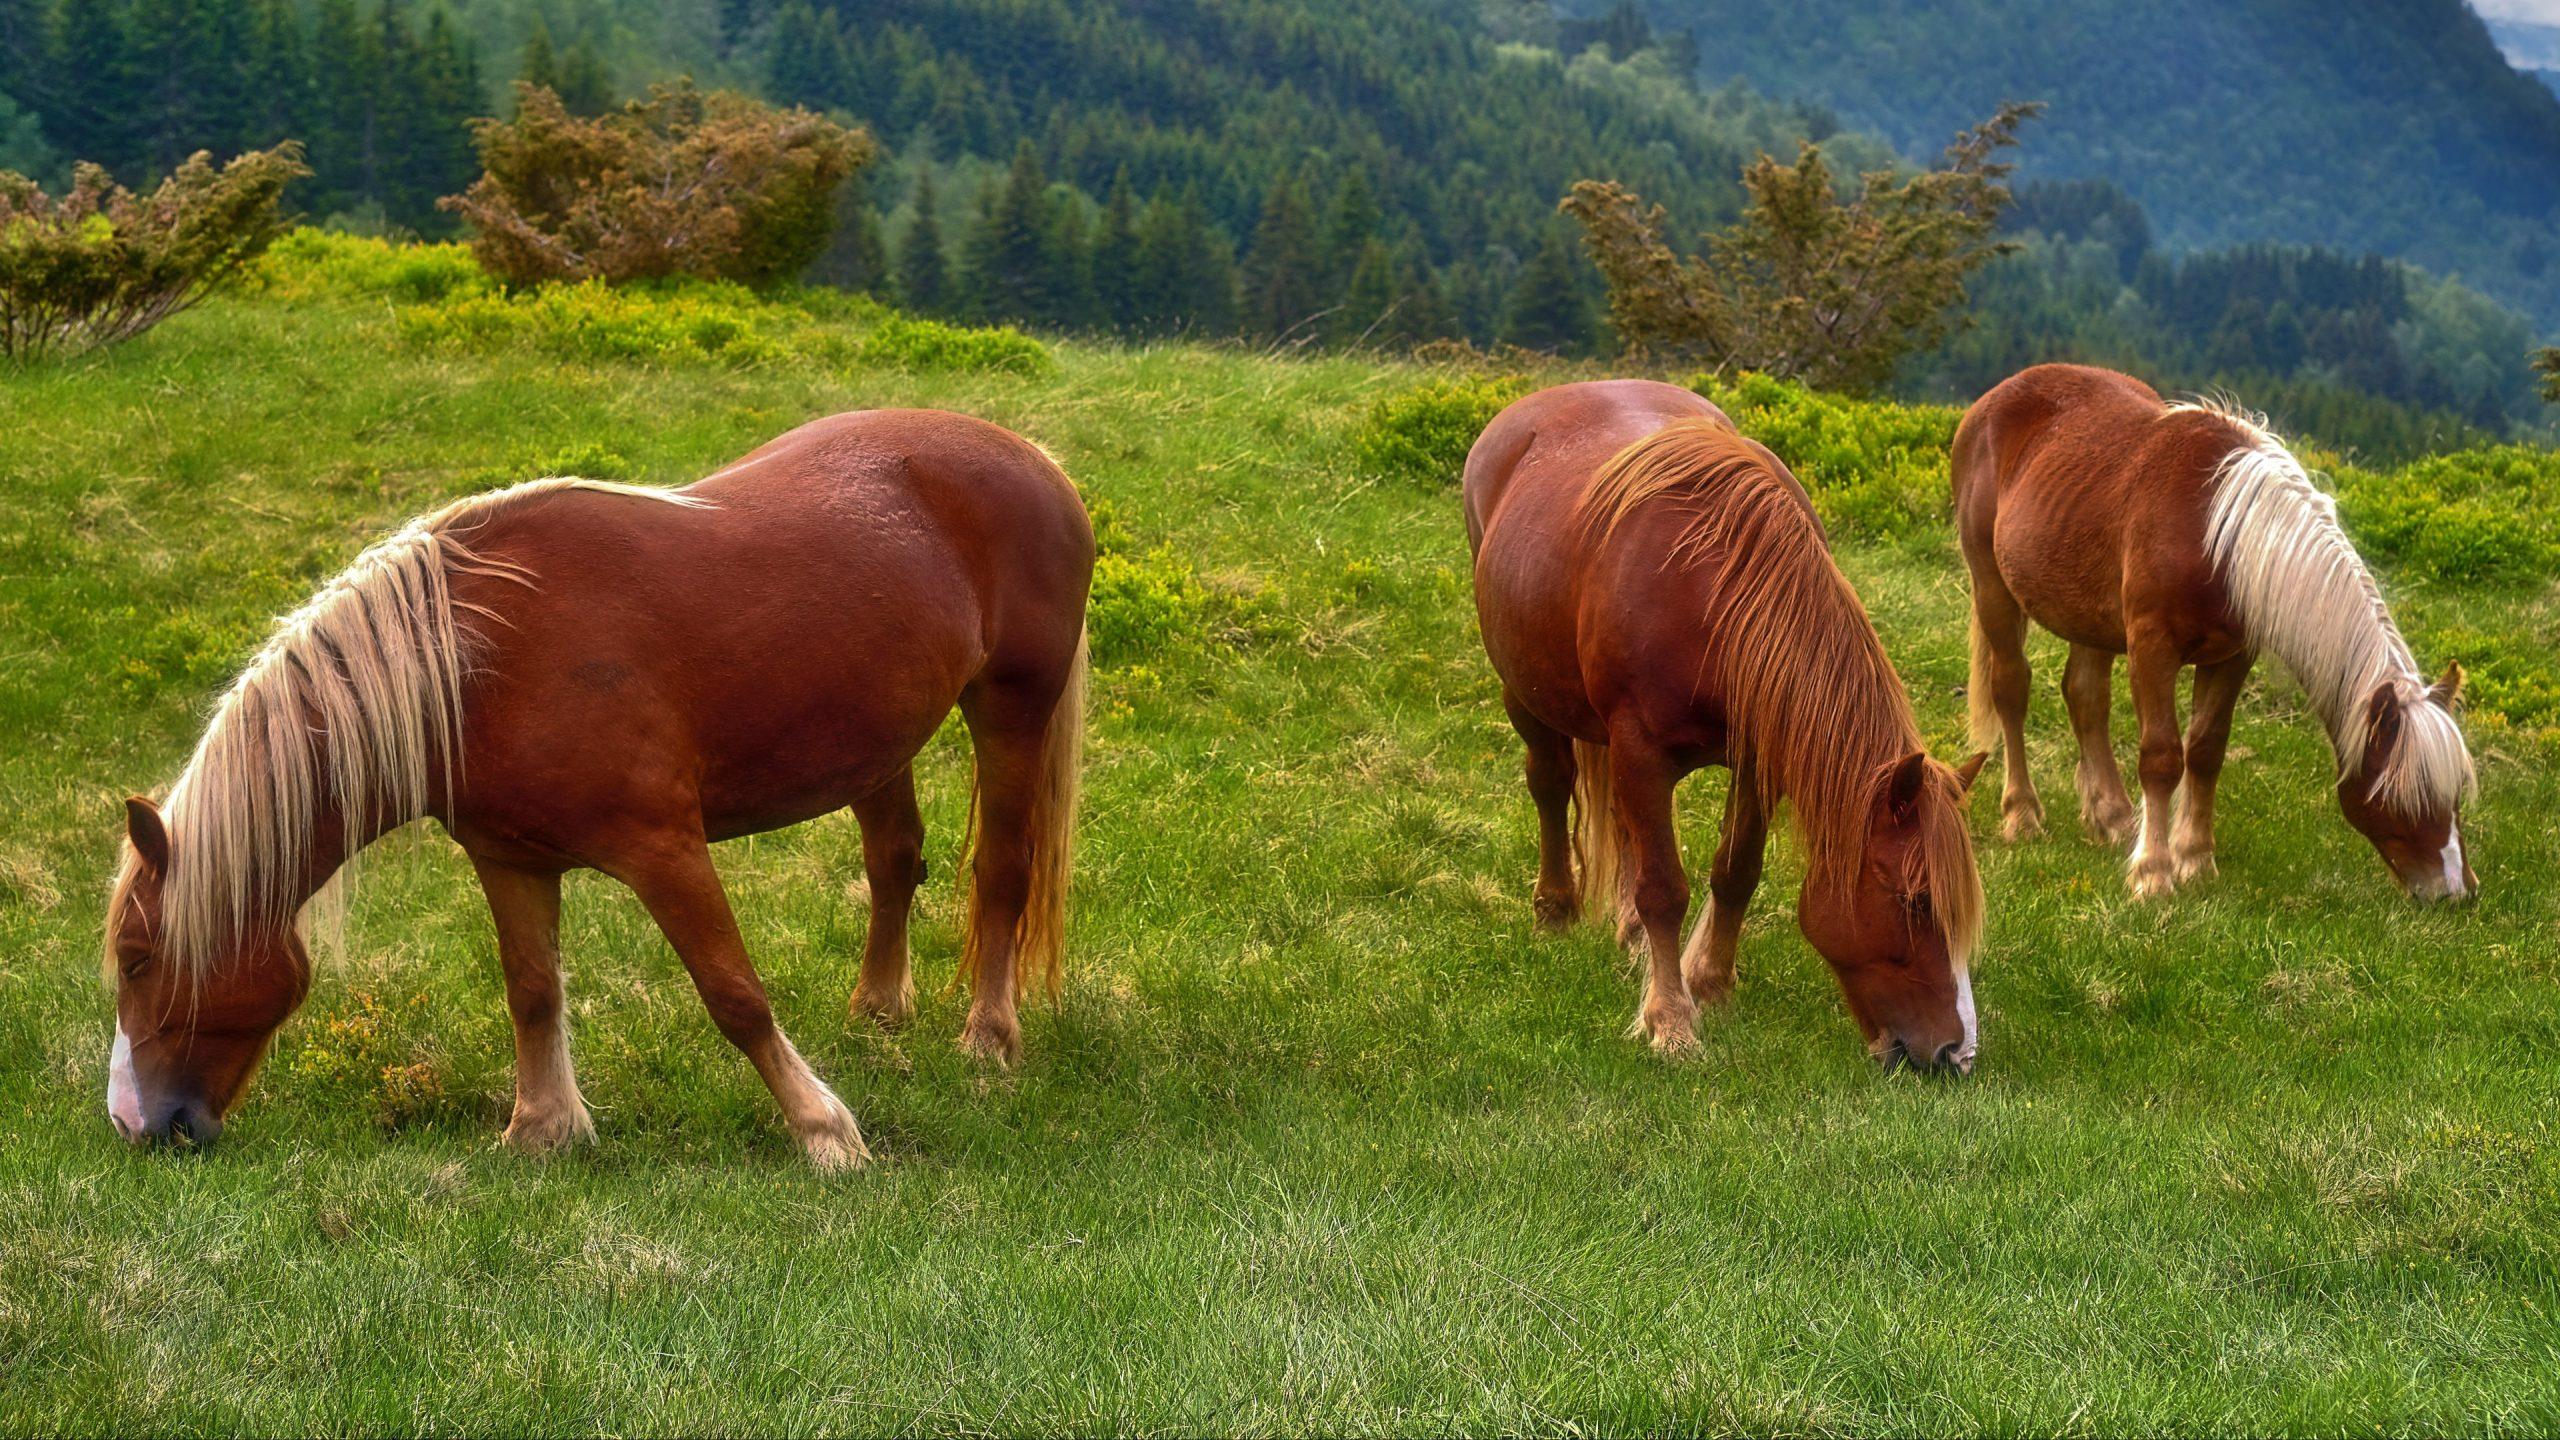 Pferdebilder Kostenlos Runterladen bestimmt für Pferde Bilder Kostenlos Herunterladen